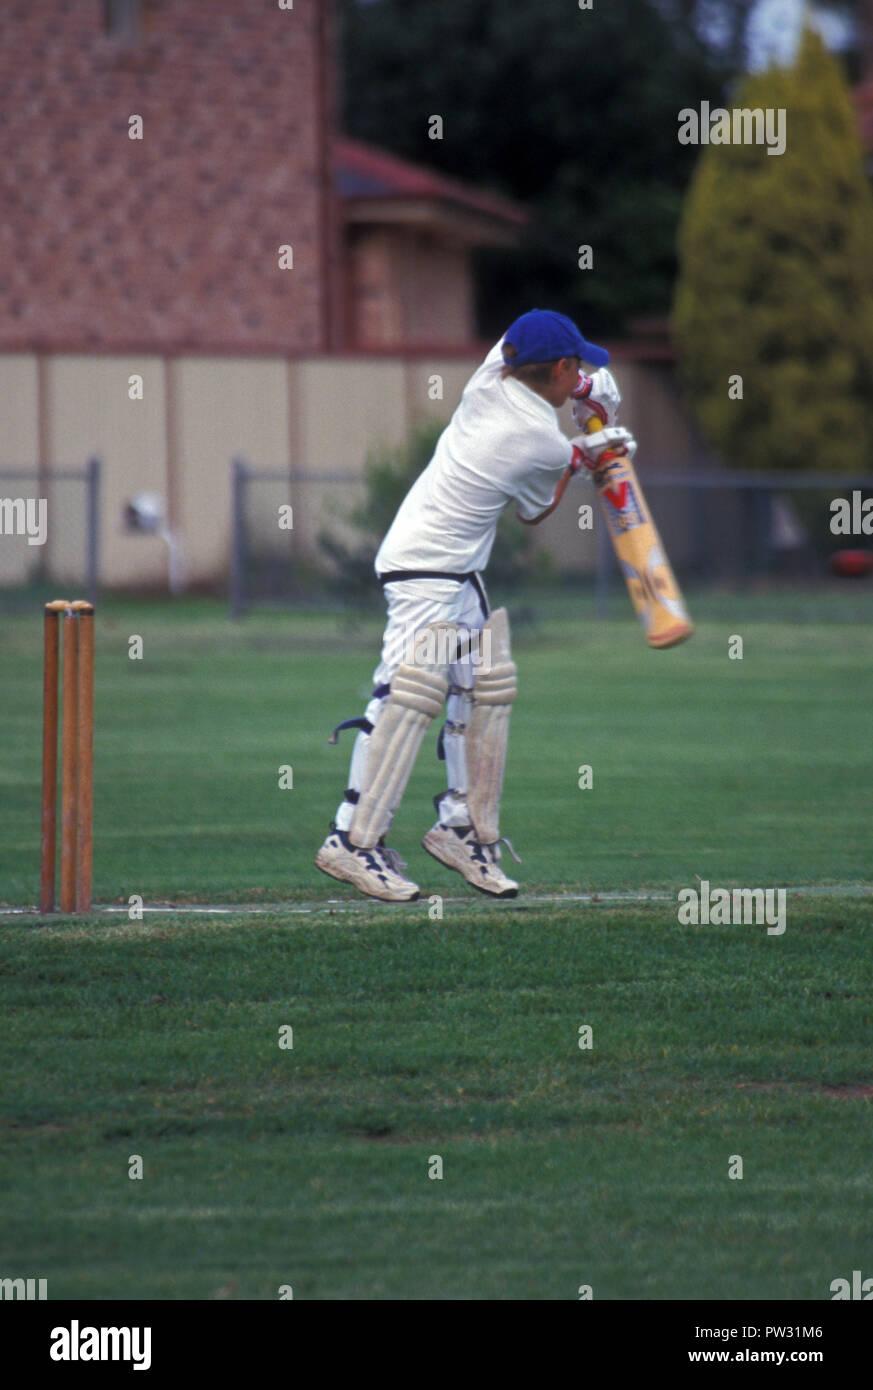 Junior cricket game in progress, Sydney, New South Wales, Australia - Stock Image